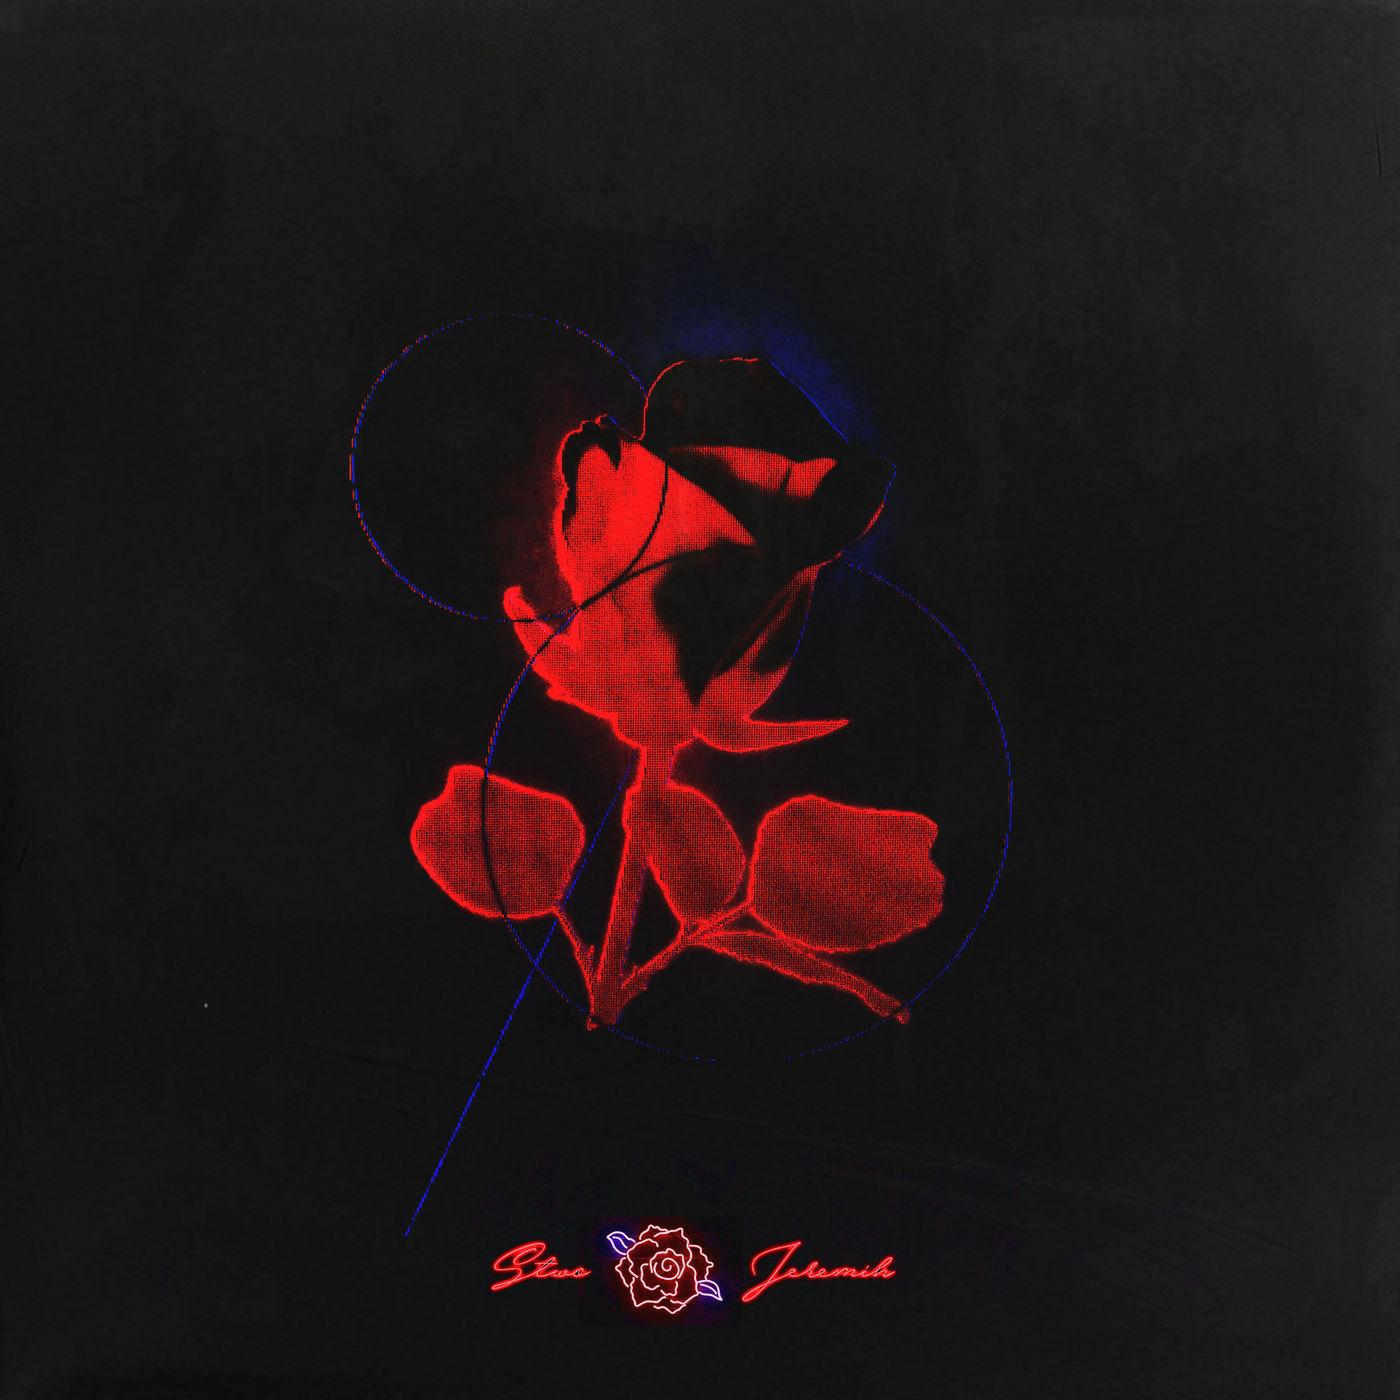 Stwo - Neither Do I (feat. Jeremih) - Single